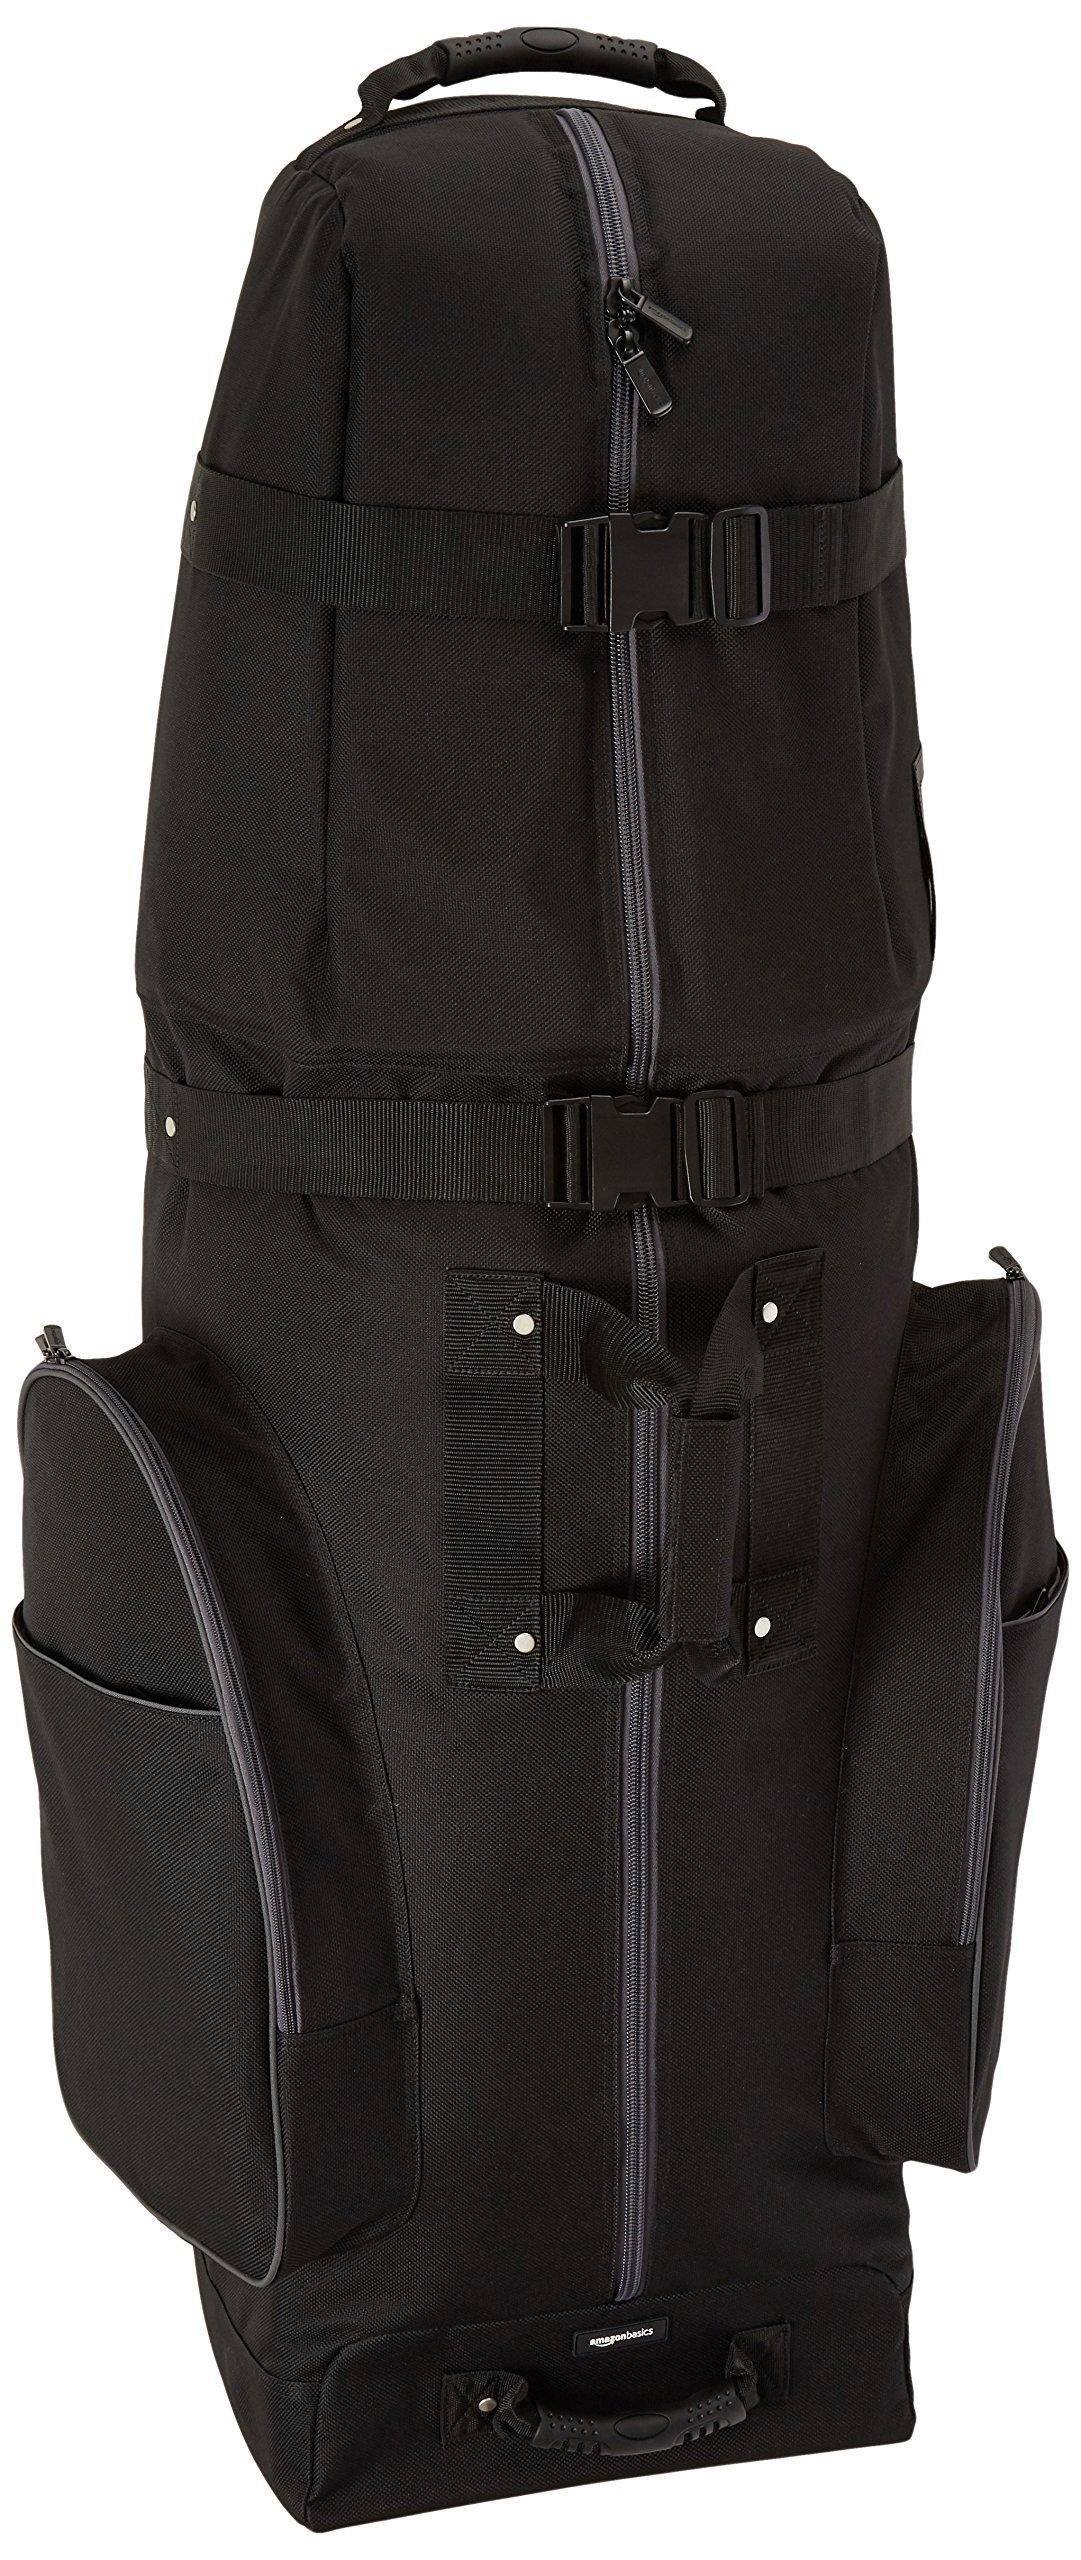 AmazonBasics Soft-Sided Golf Club Travel Bag Case With Wheels - 50 x 13 x 15 Inches, Black by AmazonBasics